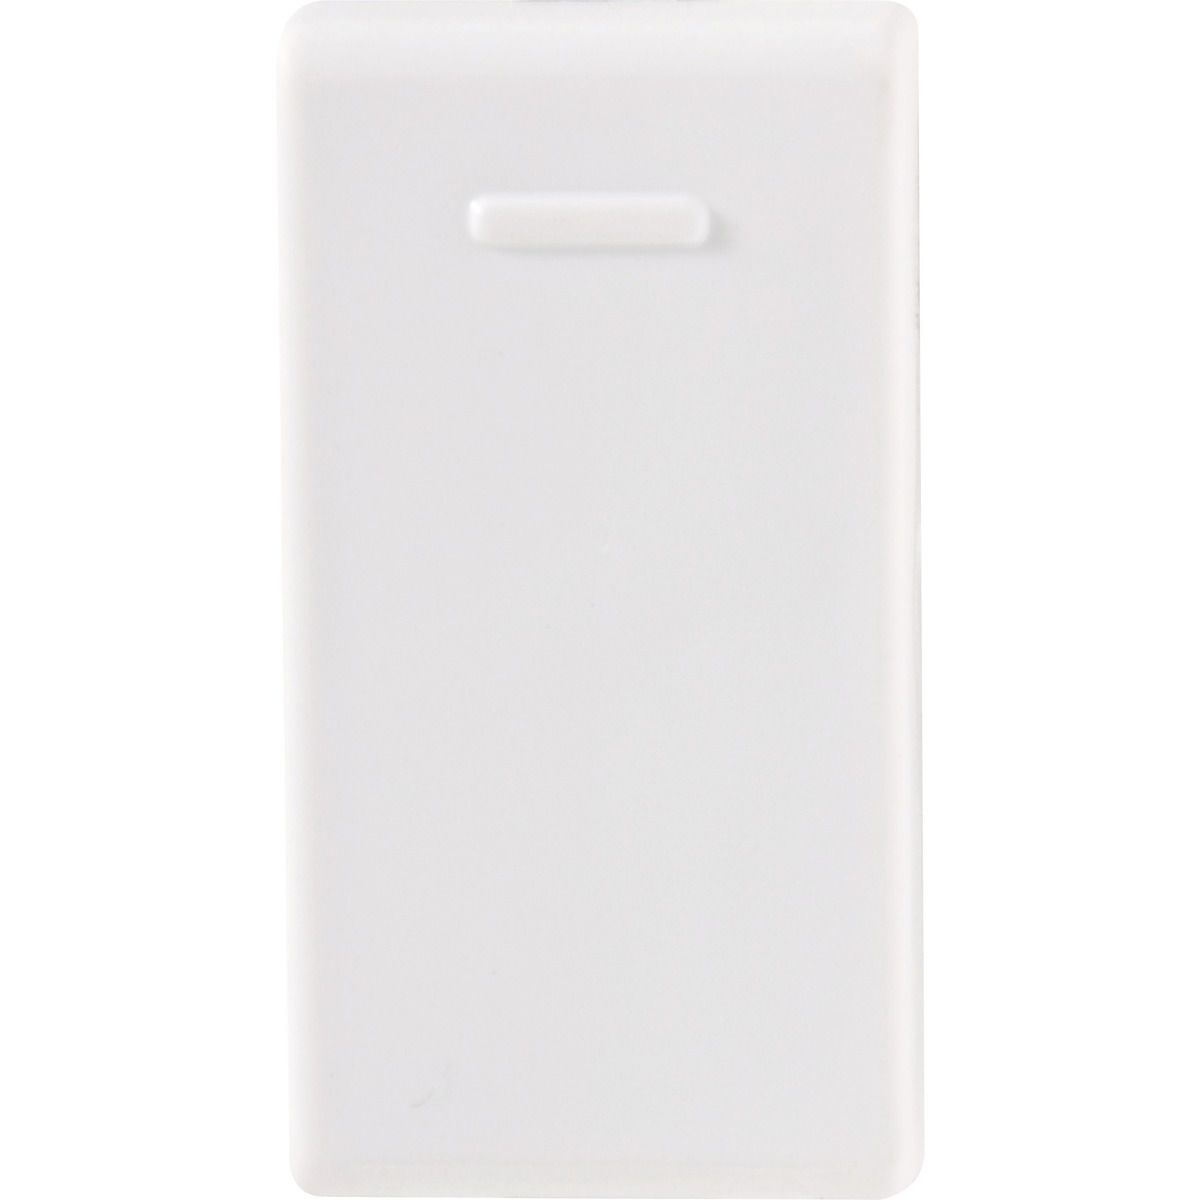 Módulo interruptor simples 10A 250V - Branco